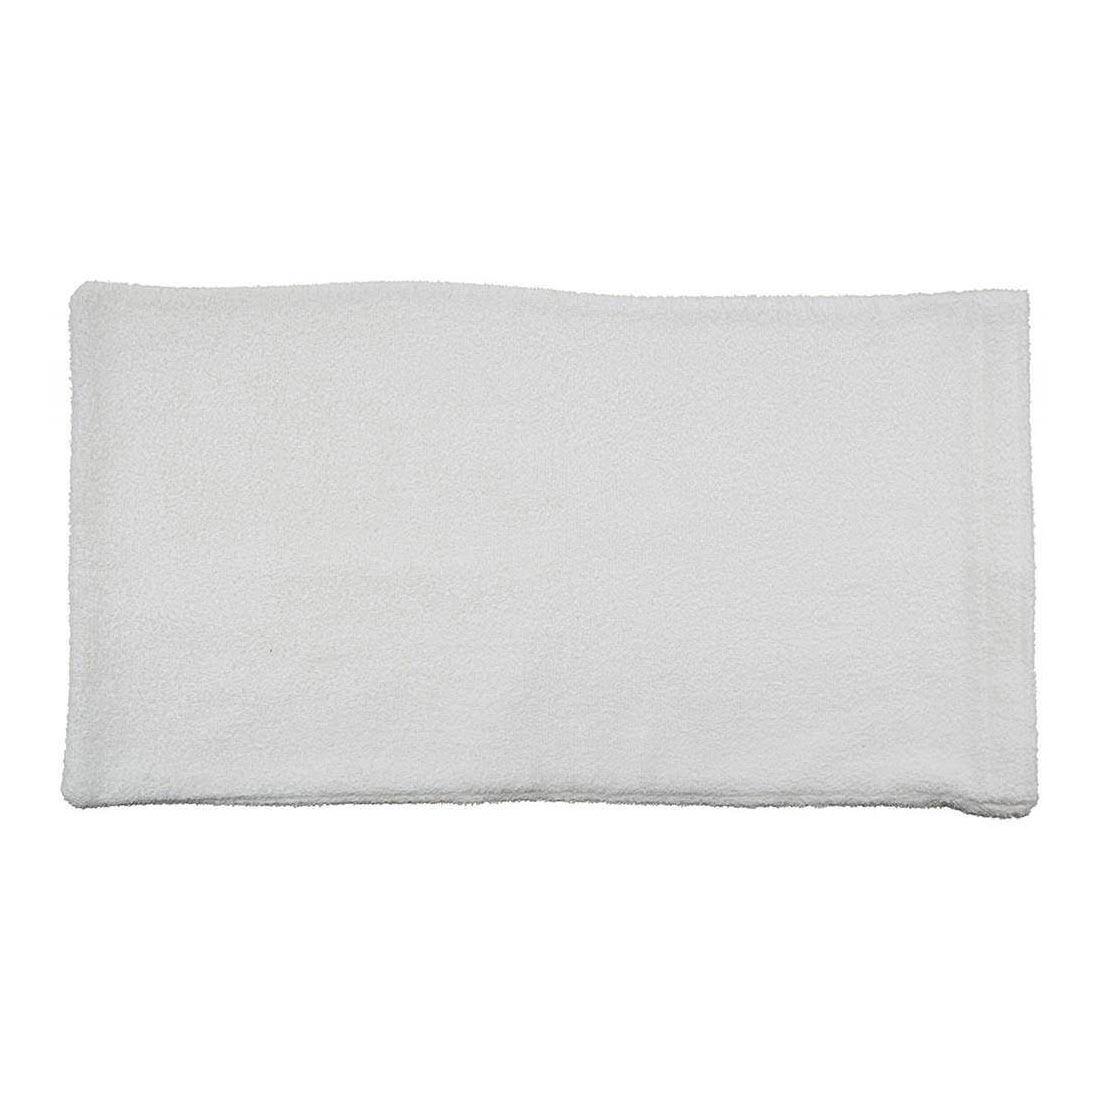 Sammons Preston | TumbleForm Versa Form Pillow Covers | Performance Health